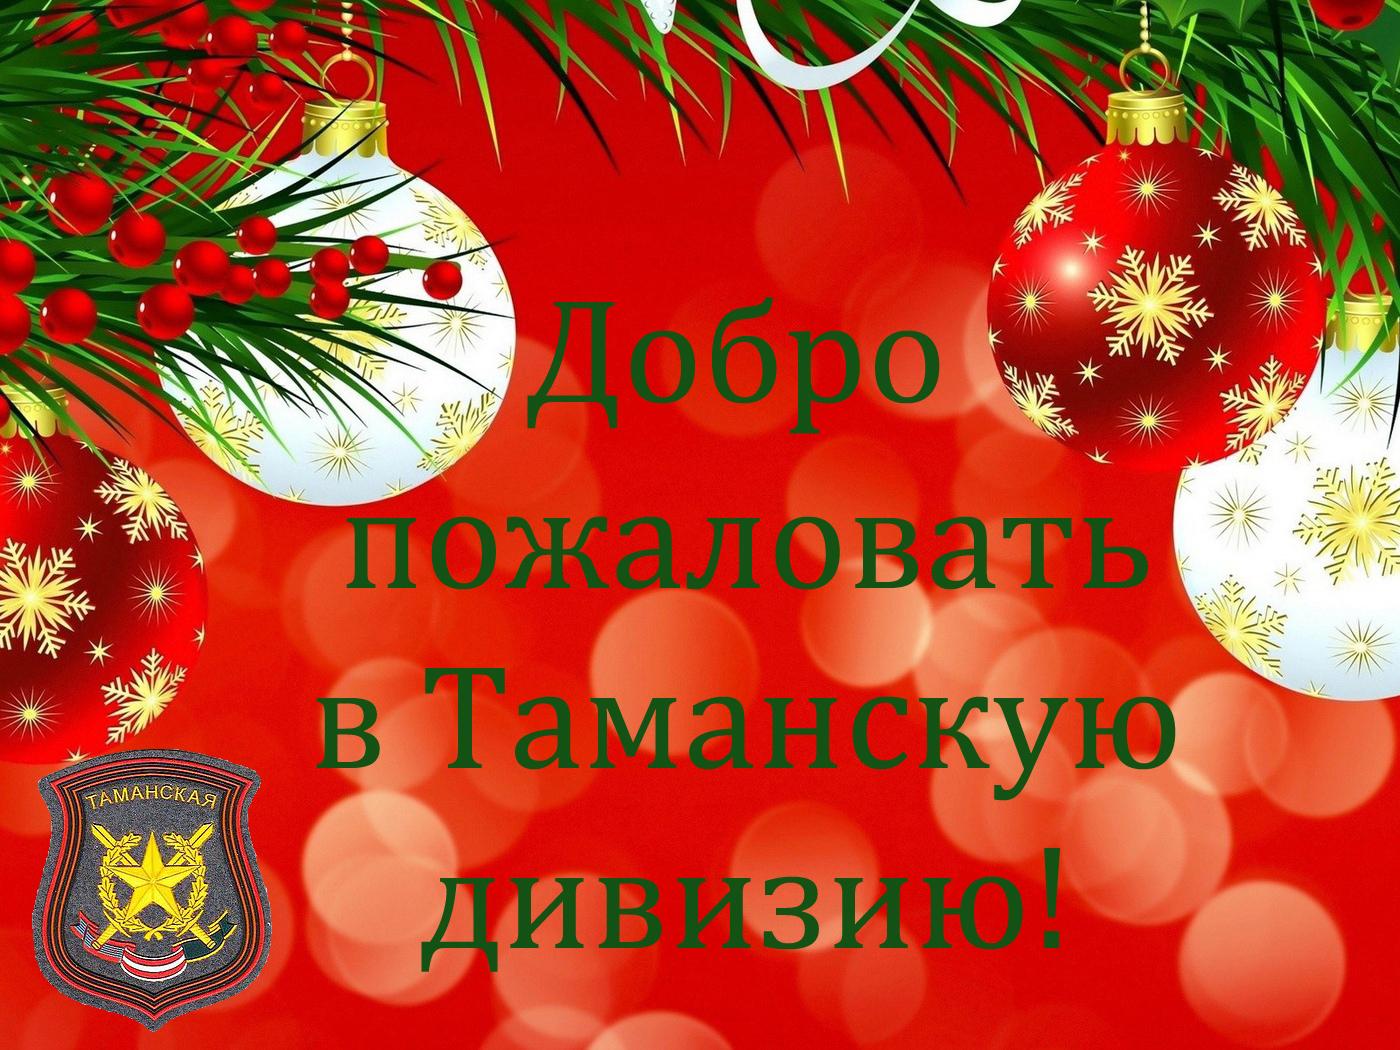 http://s2.uploads.ru/TOpdy.jpg